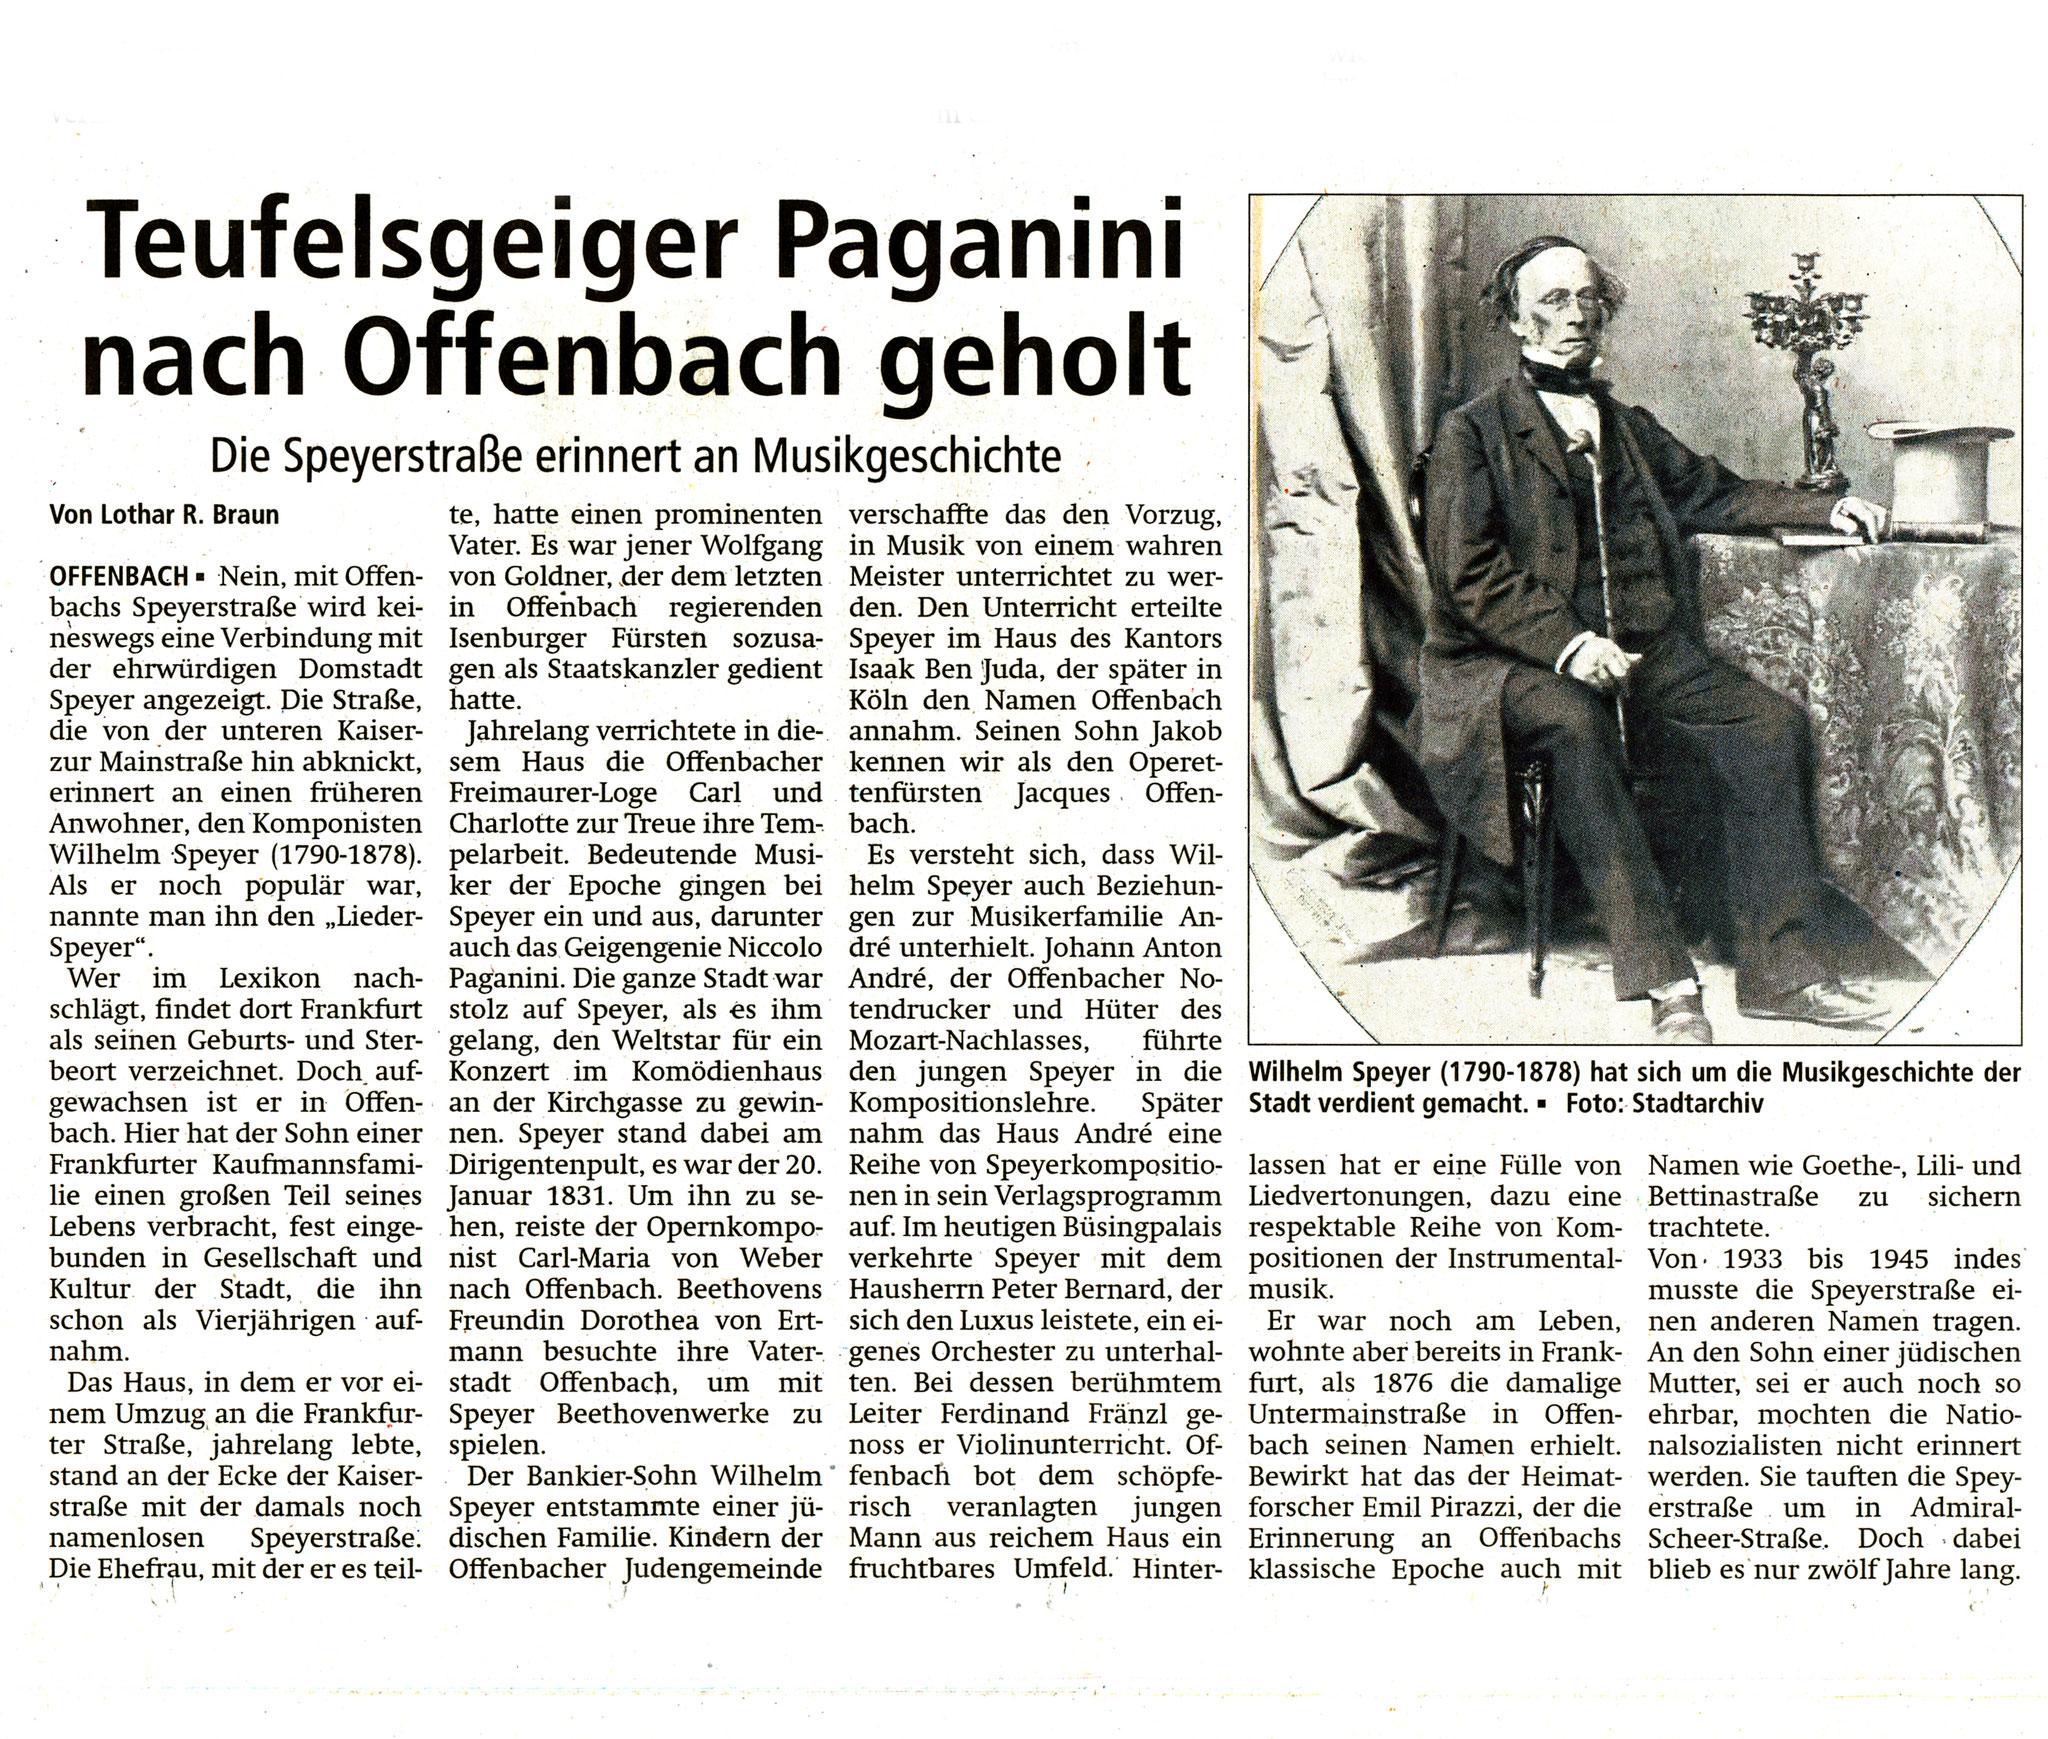 Offenbach Post, 20. Juni 2017